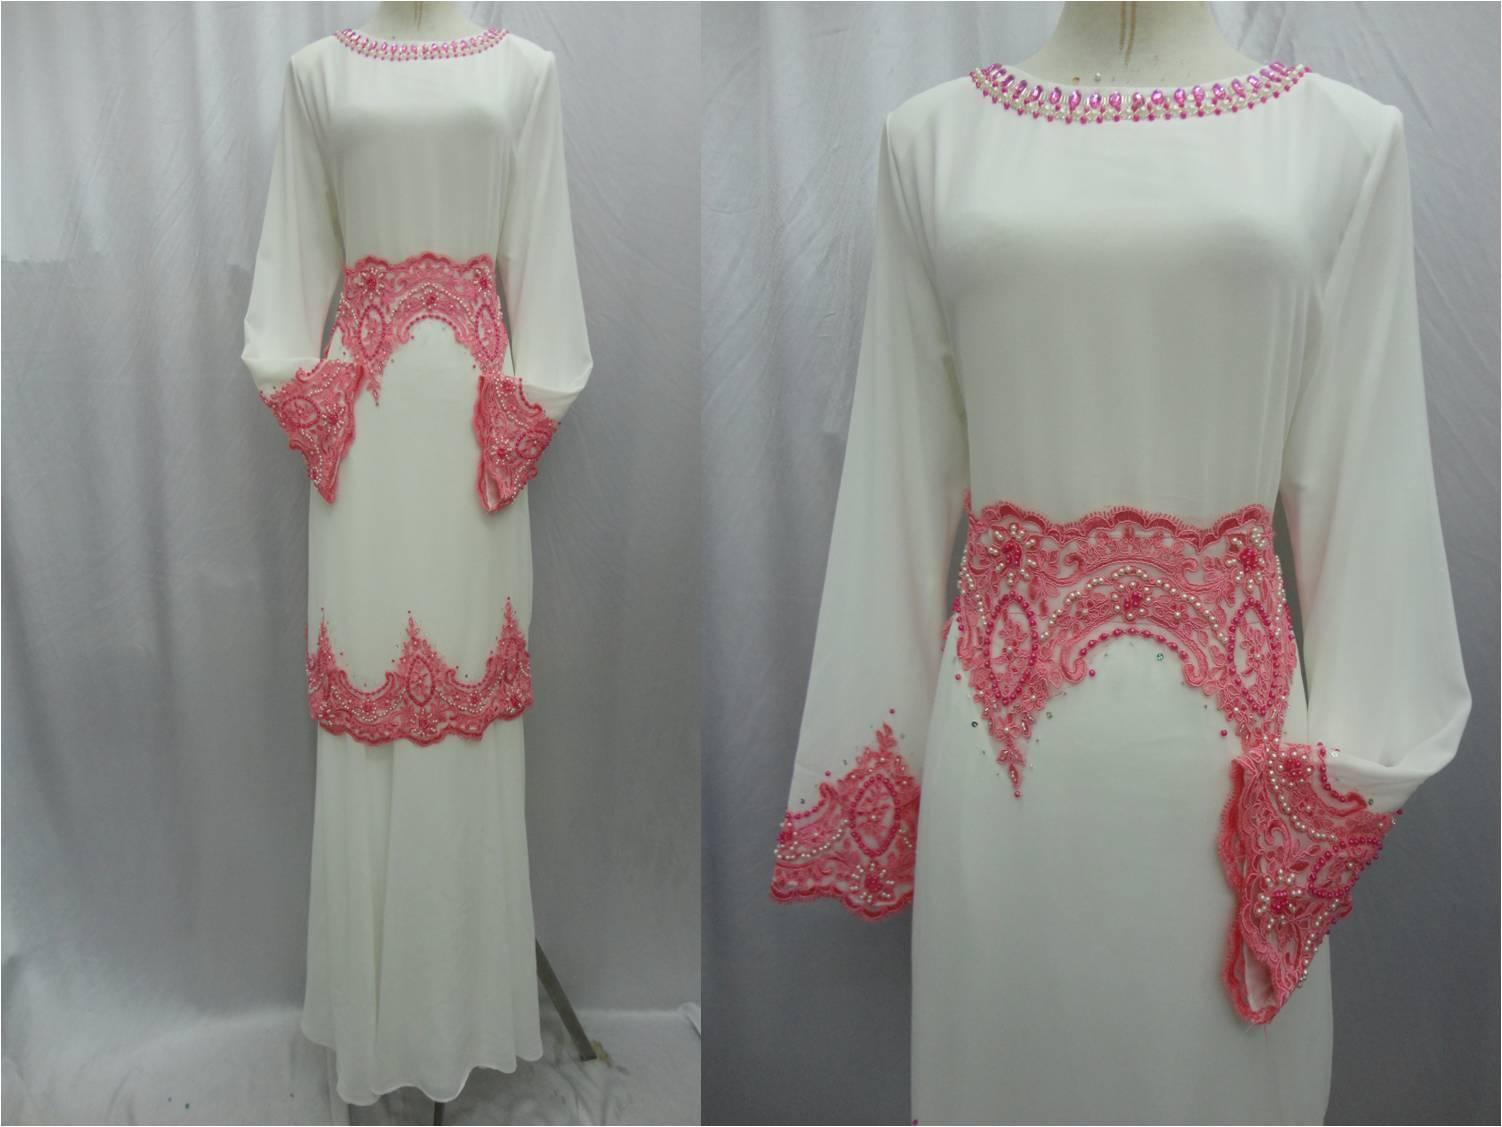 ... Shirt Muslimah | Kebaya | Skirt Labuh | Cardigan |: BAJU KURUNG MODEN